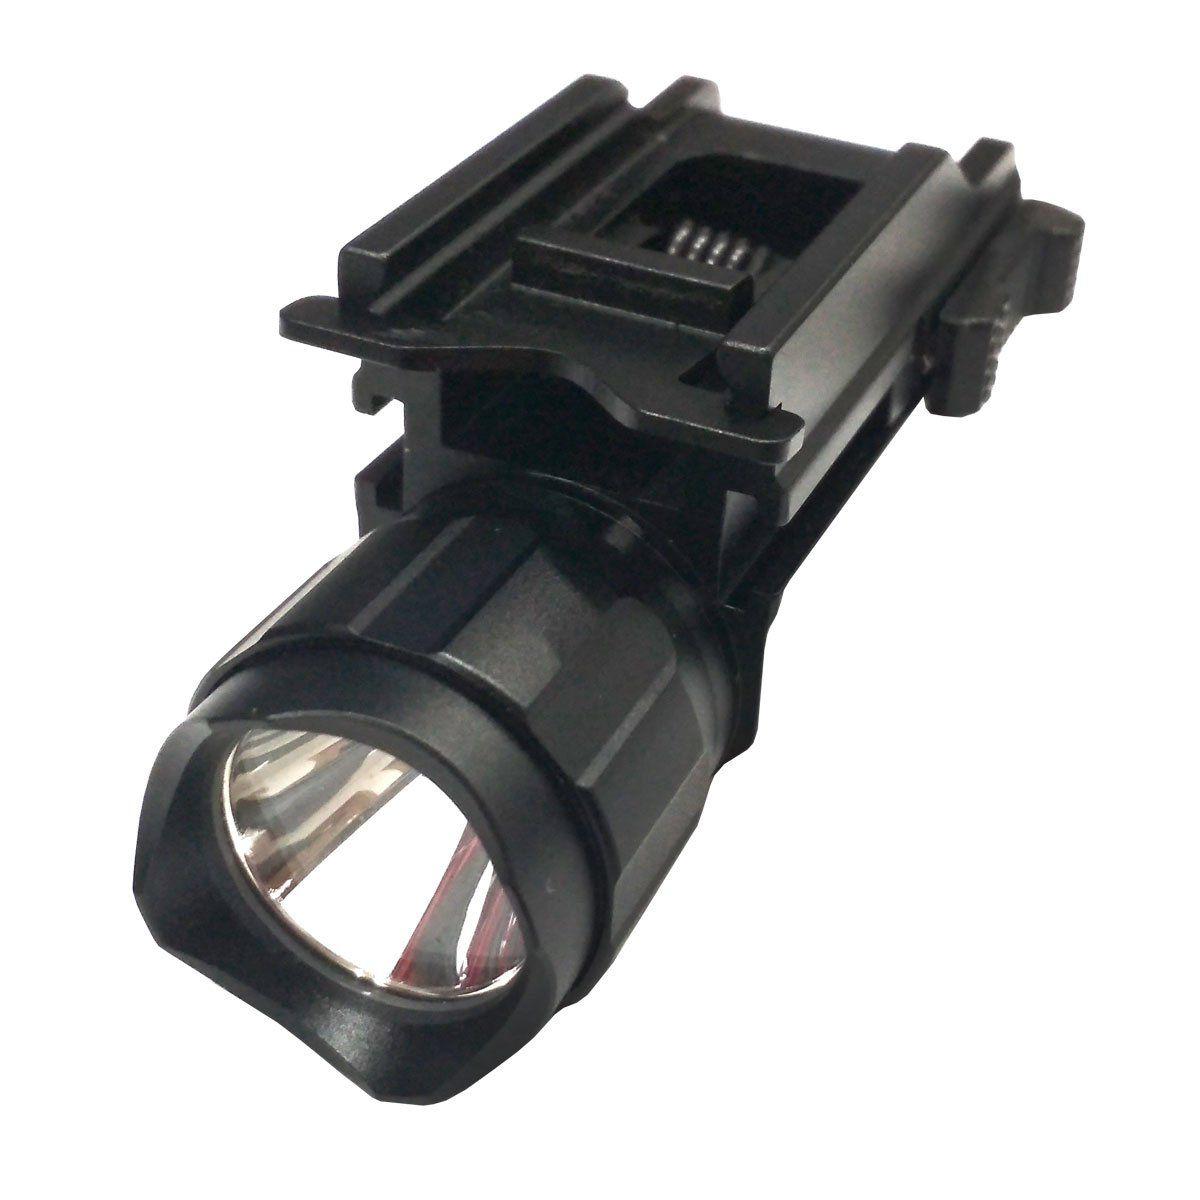 Lanterna Tática HiLight P20 300 até 500 Lumens